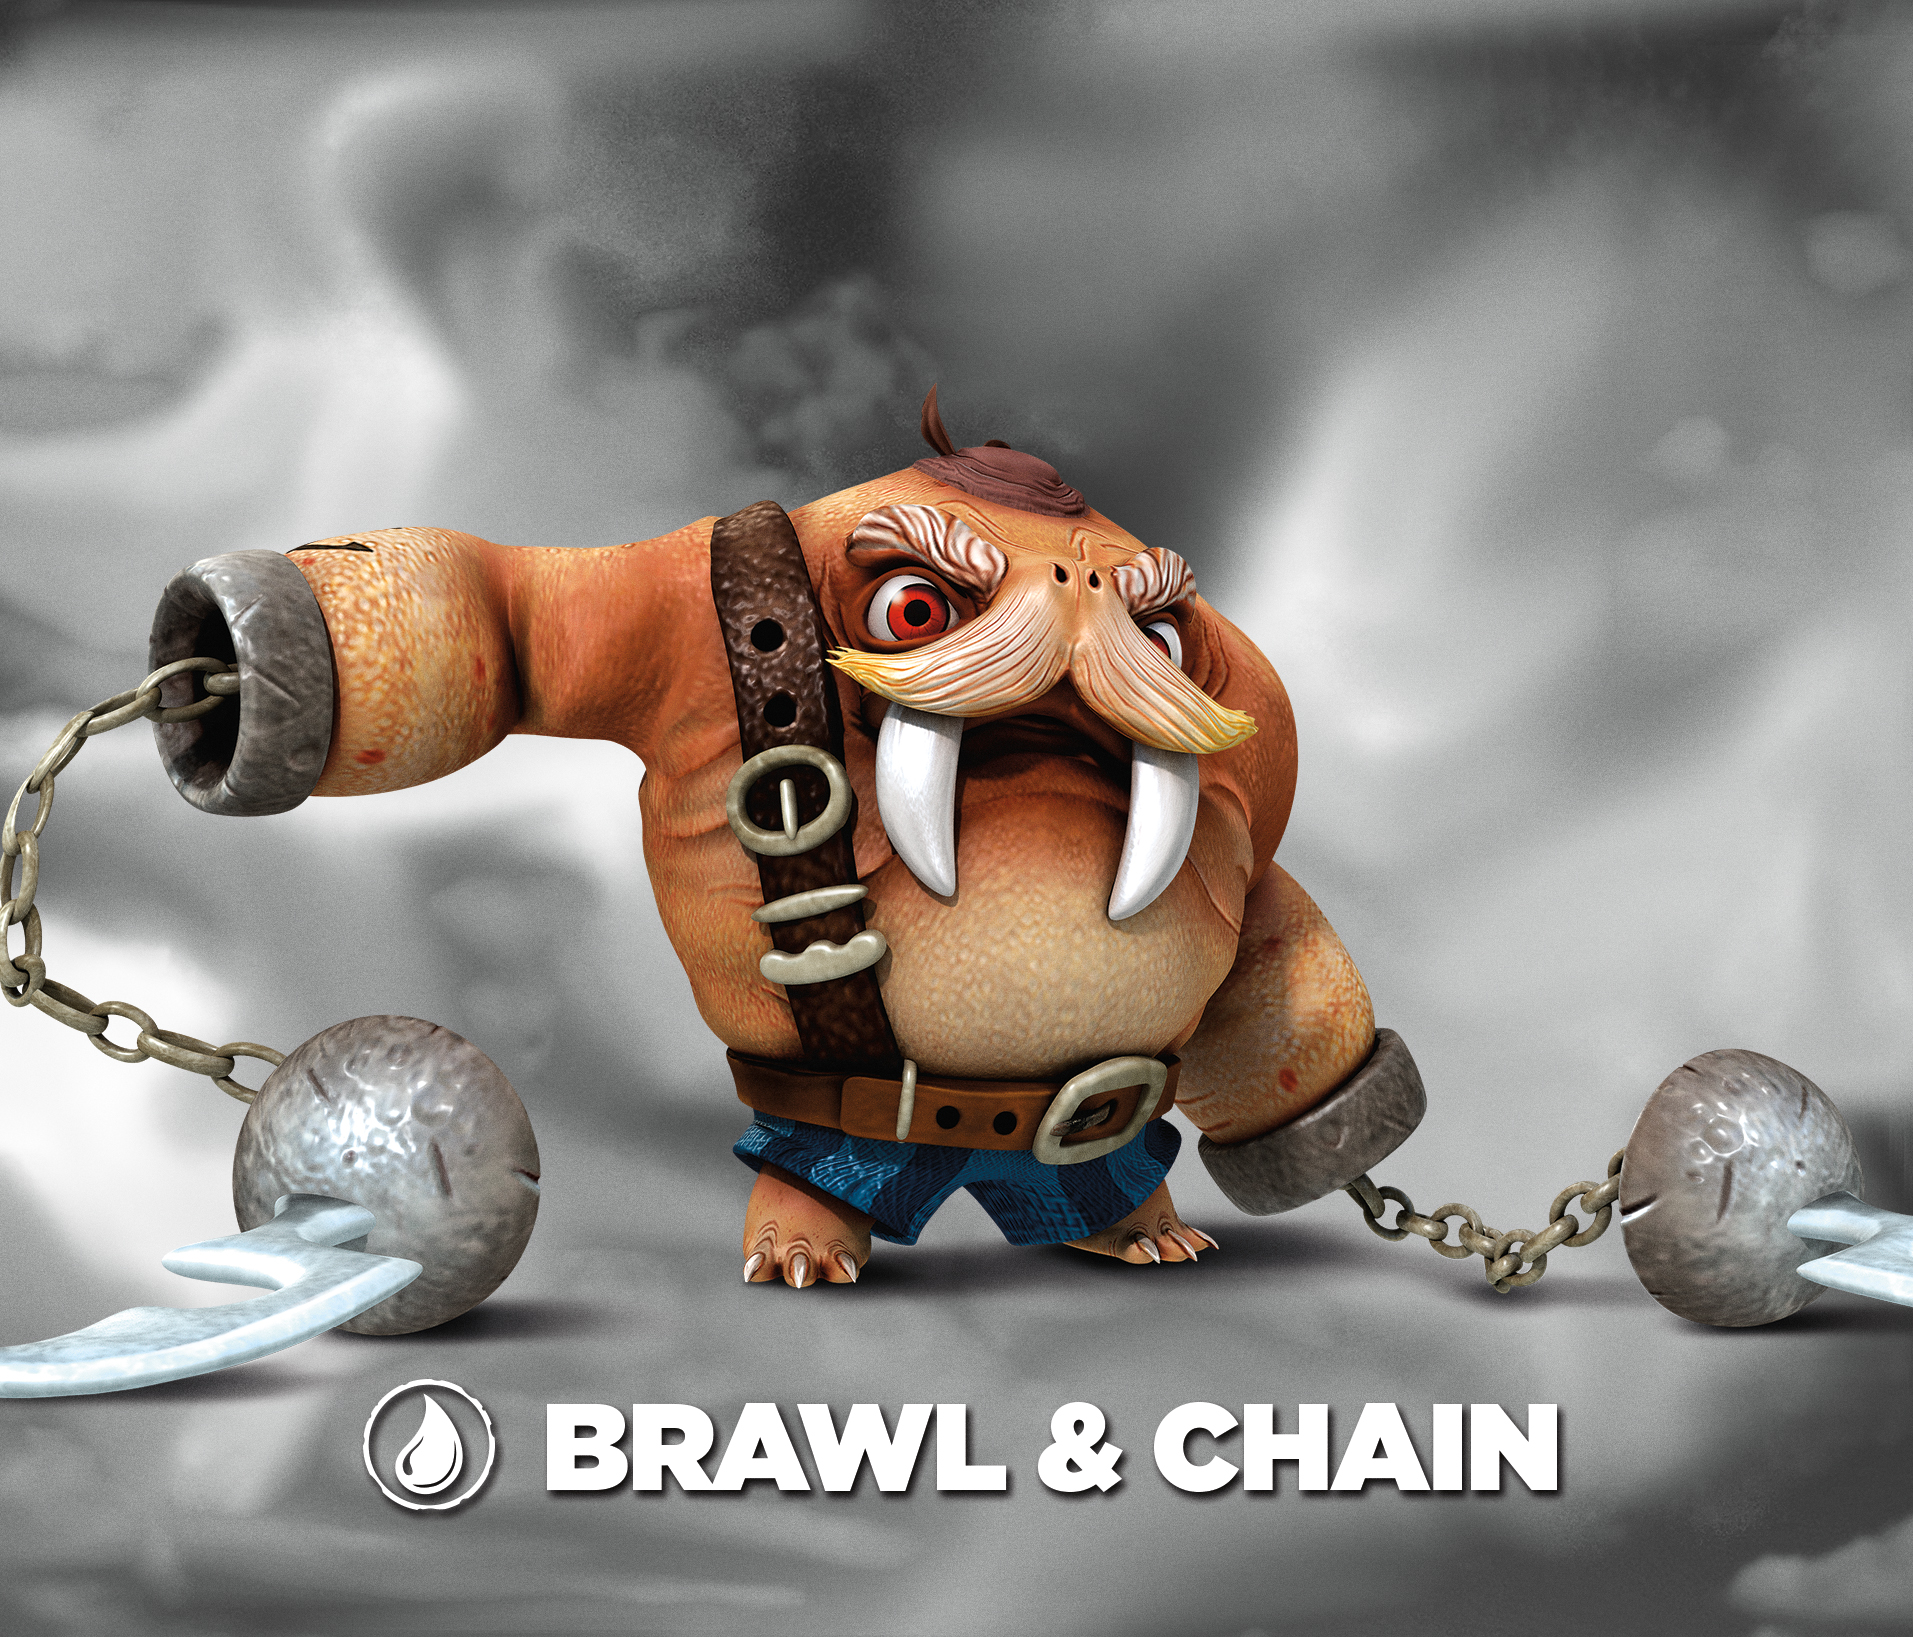 Brawl Amp Chain Villain Skylanders Wiki Wikia